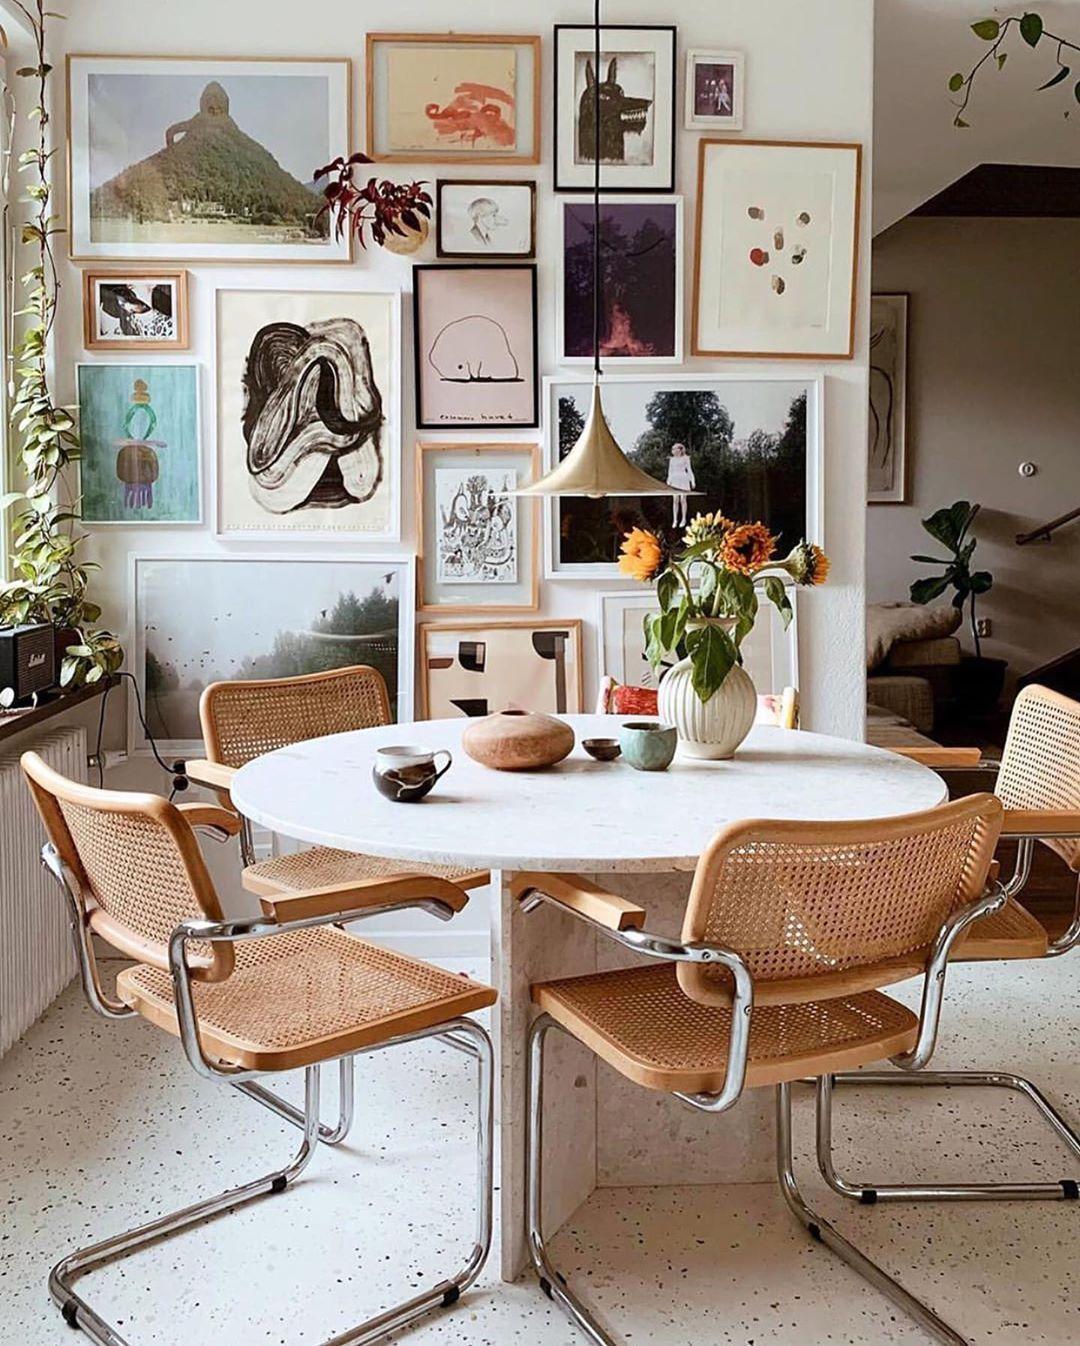 "Marc Costa on Instagram: ""#interiors #interiordesign #design #homedecor #decor #artwall #architecture #architecturaldigest #instadaily #inspiration #photo…"""